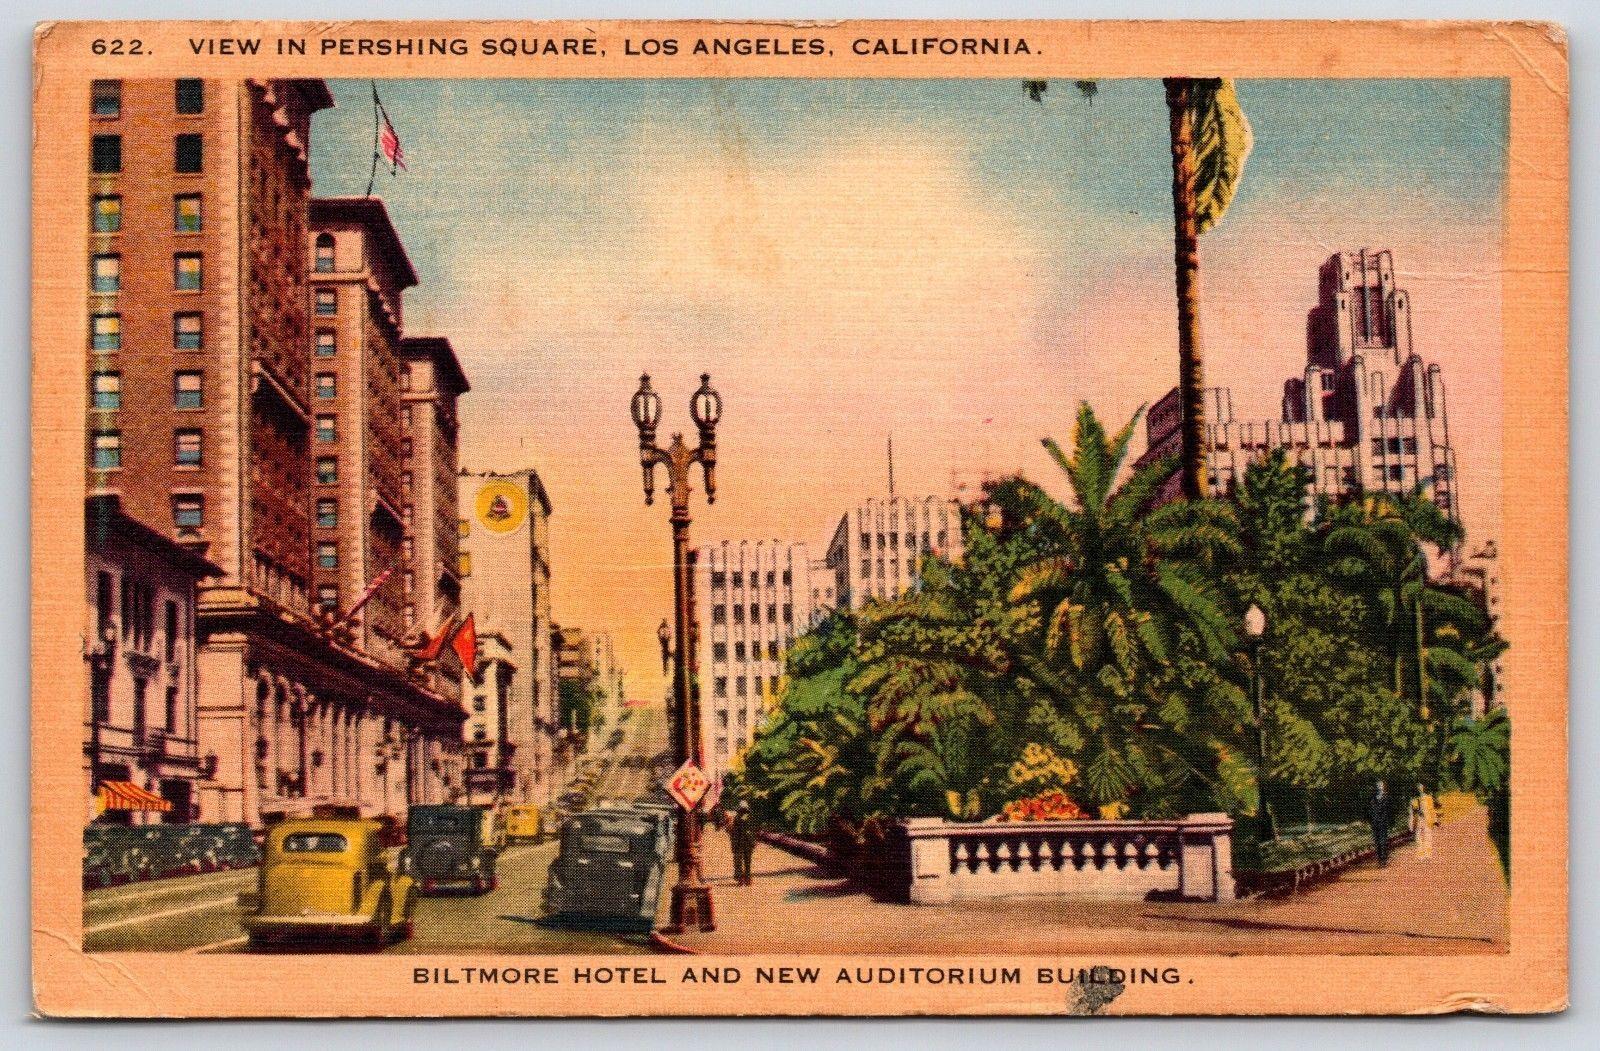 Biltmore Hotel Auditorium Pershing Square Los Angeles California Linen Postcard 5 99 Biltmore Hotel Auditori California Postcard Postcard Vintage Postcard